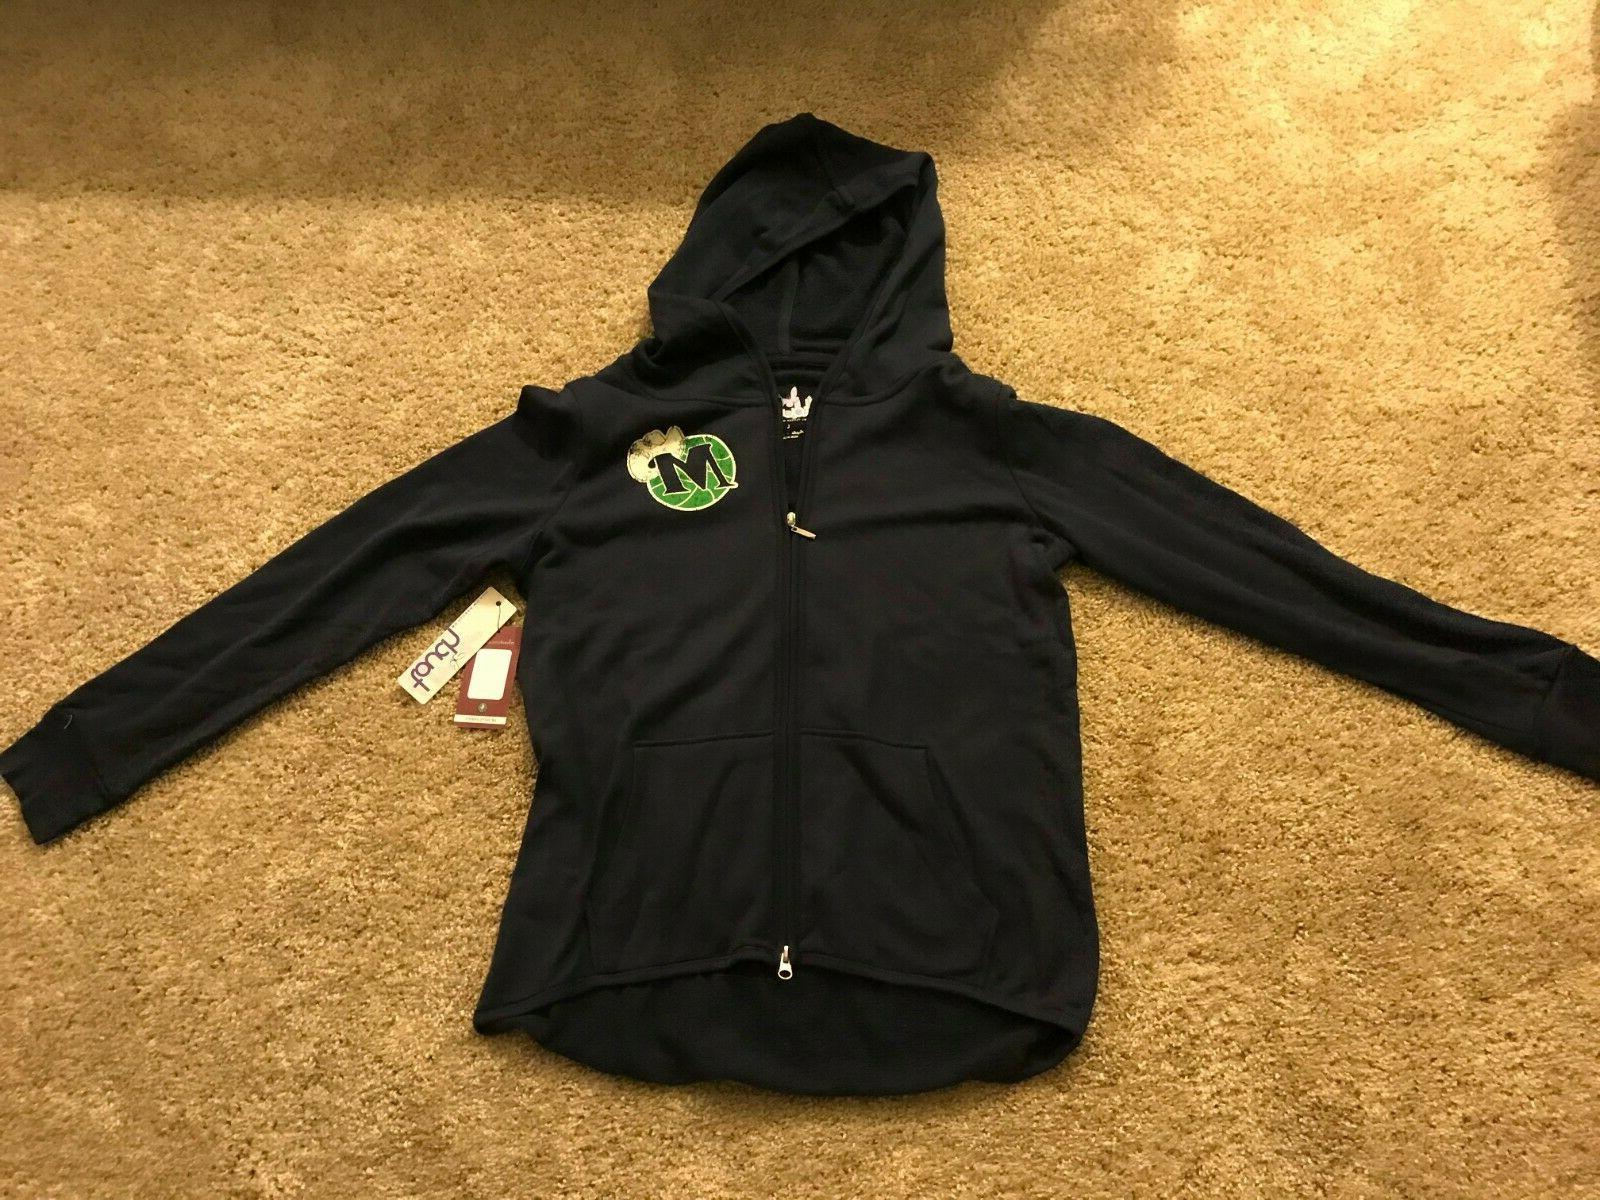 dallas mavericks womens licensed jacket size large